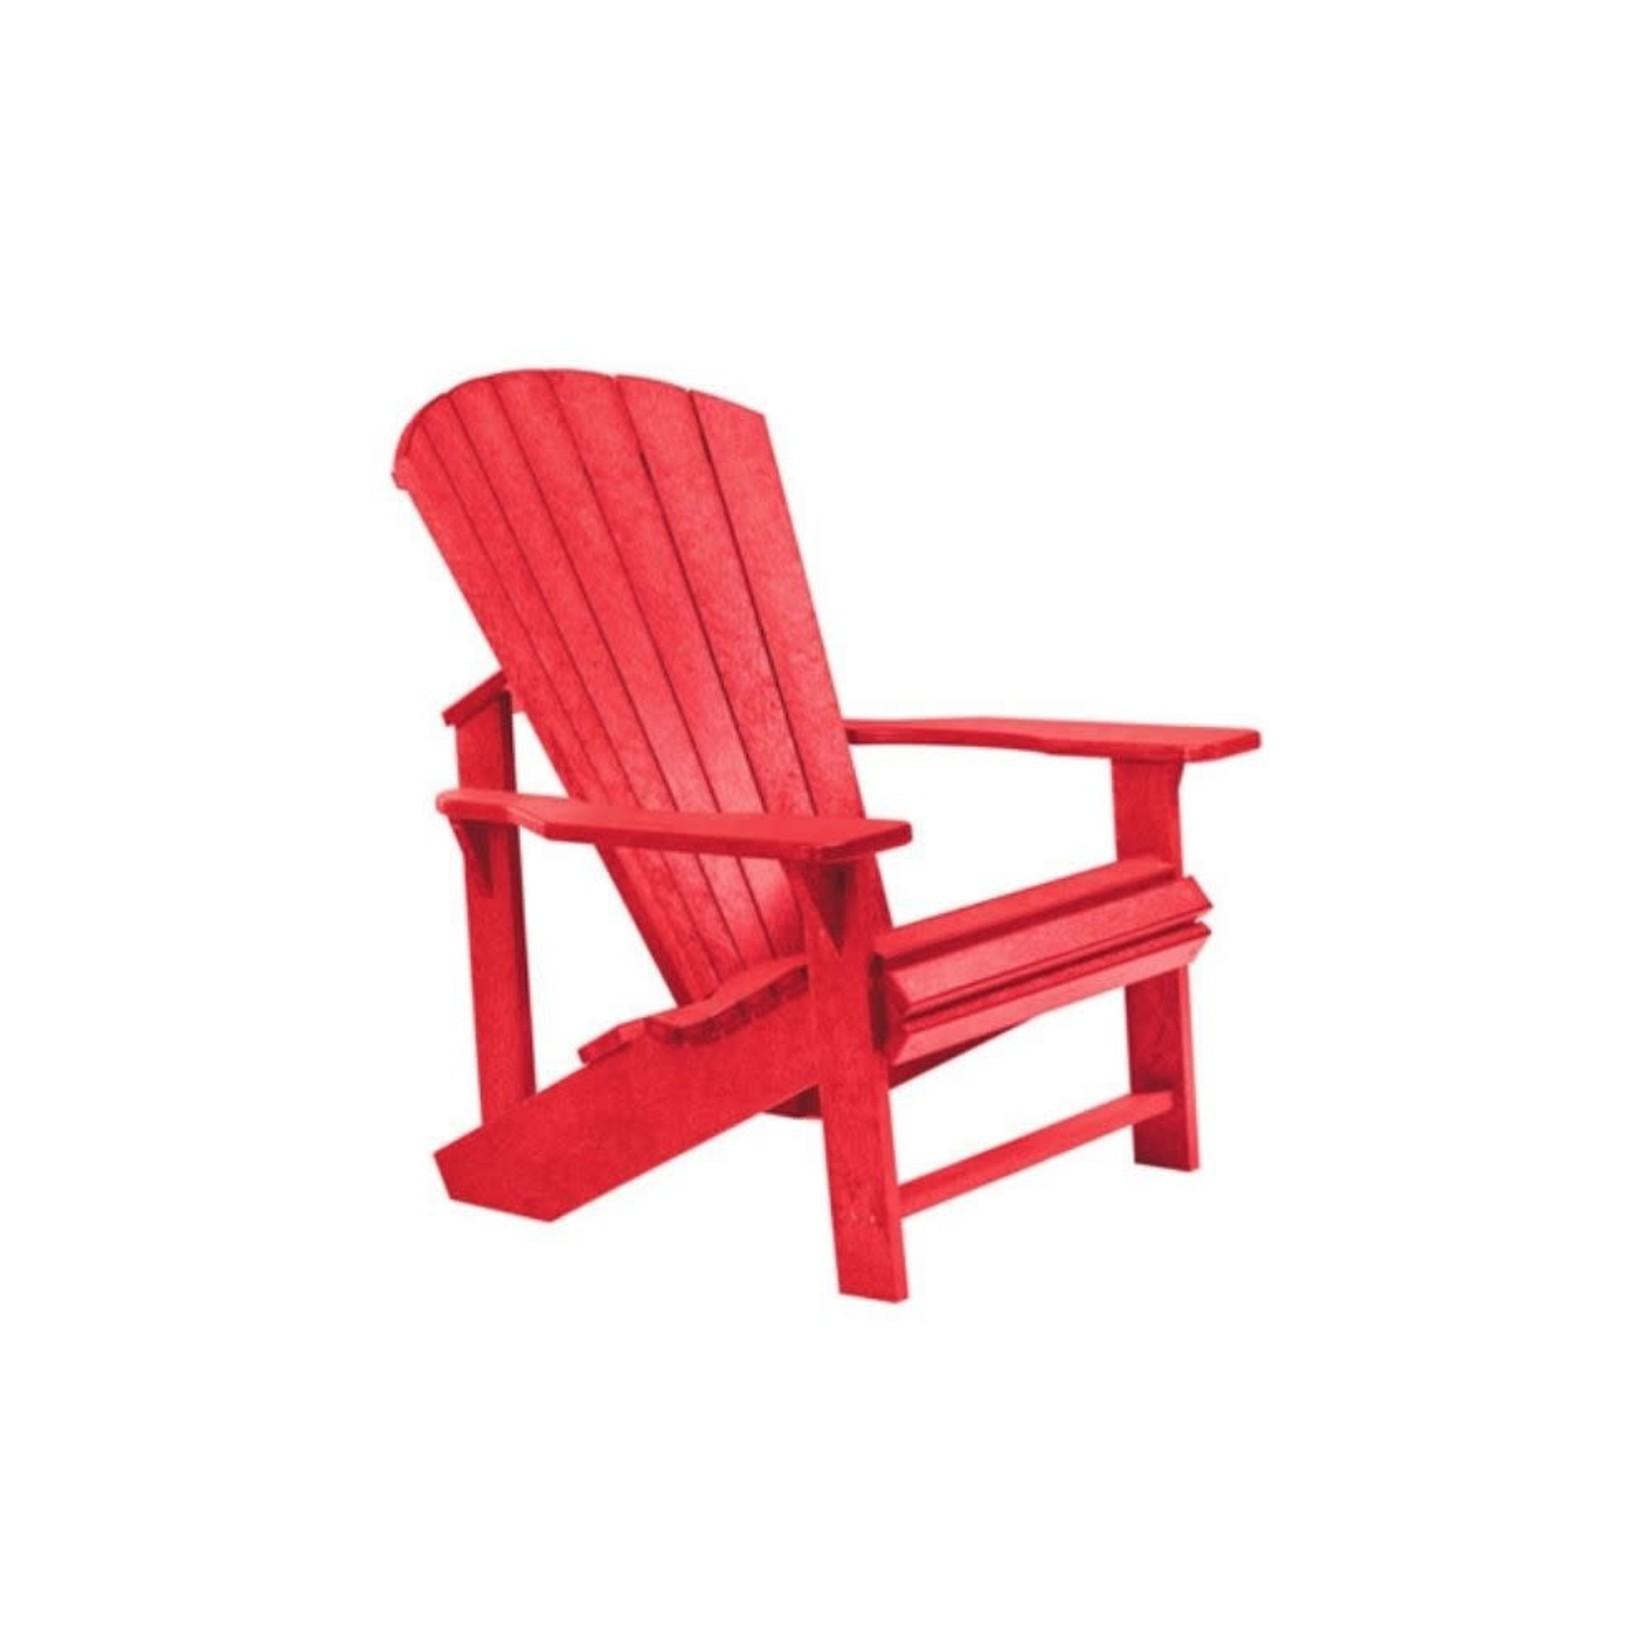 Classic Adirondack Chair Red 01